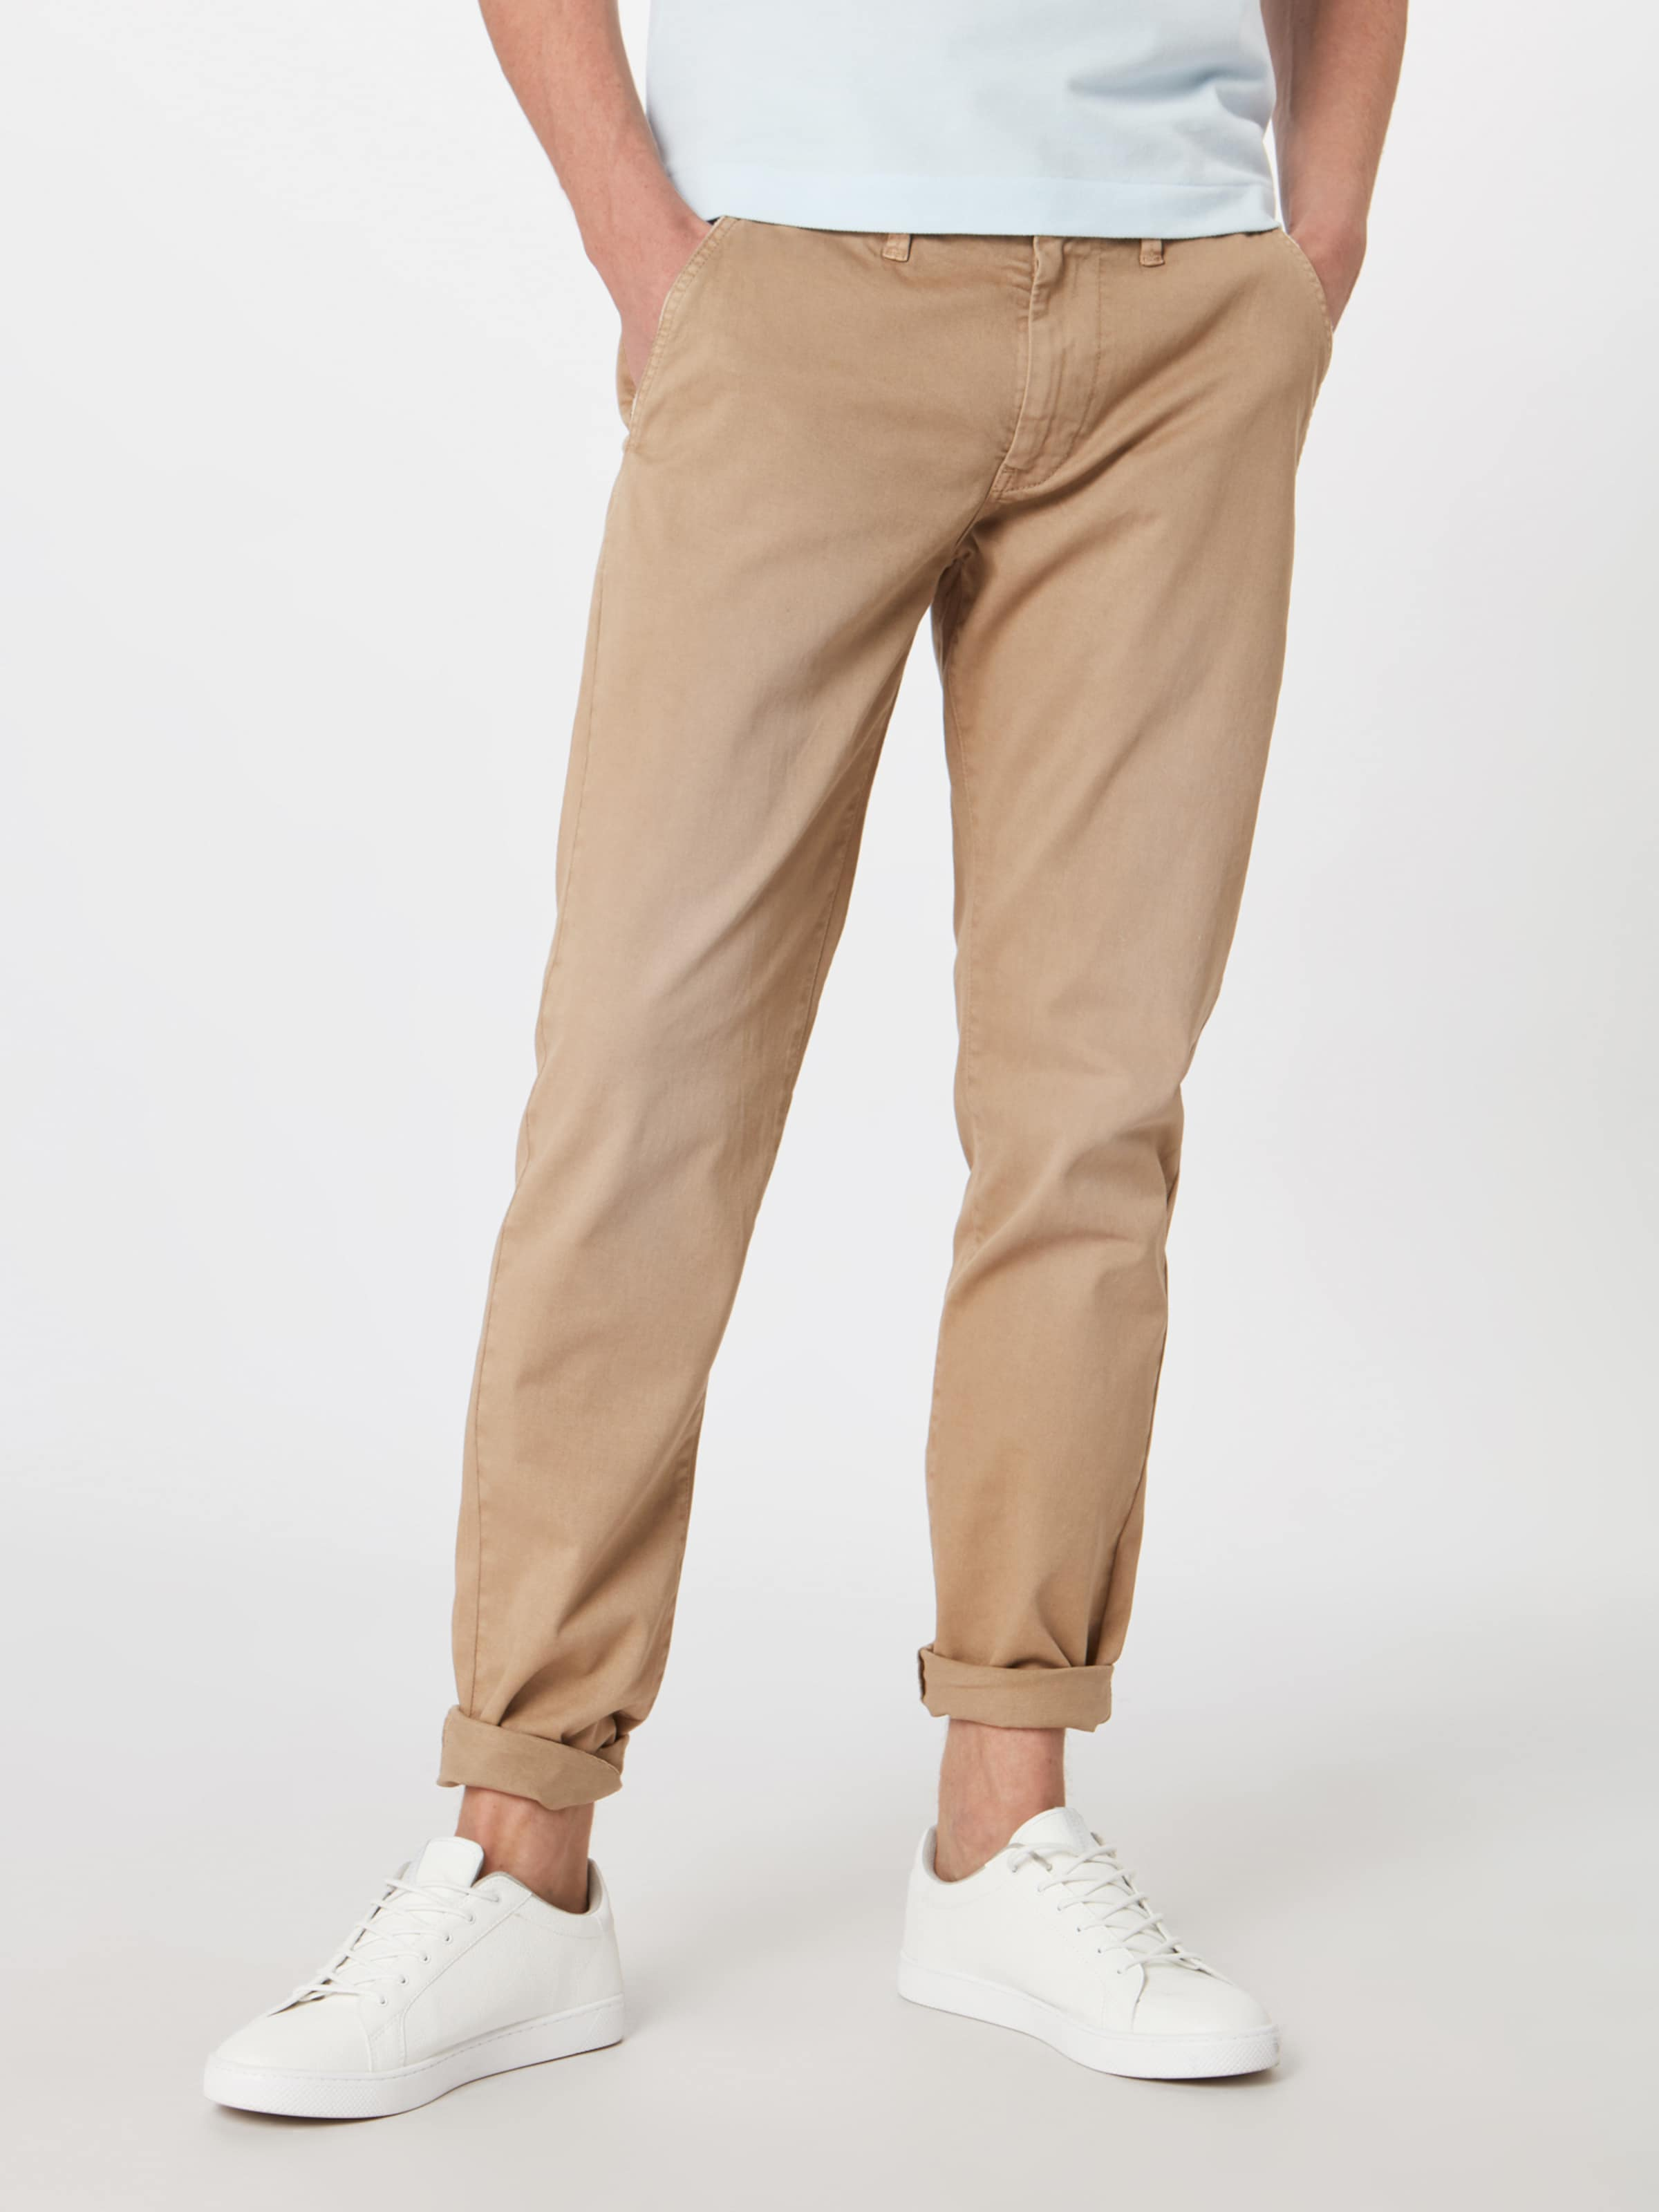 Khaki Pepe Jeans 'sloane' In Hose LSqVzpUMG